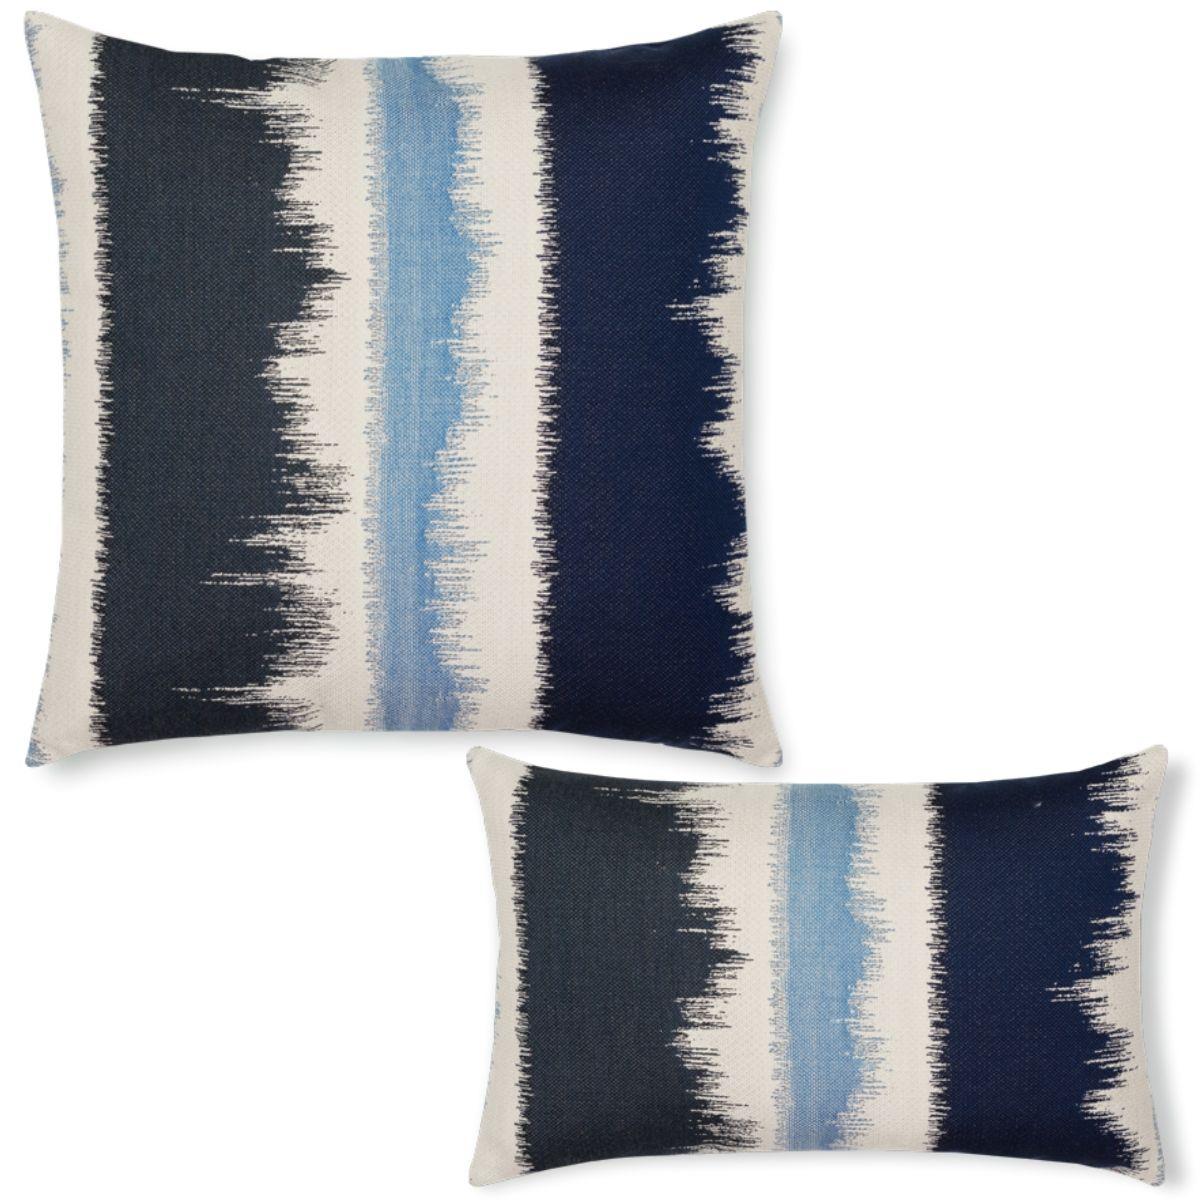 murmer-midnight-sunbrella-pillow-elaine-smith collection